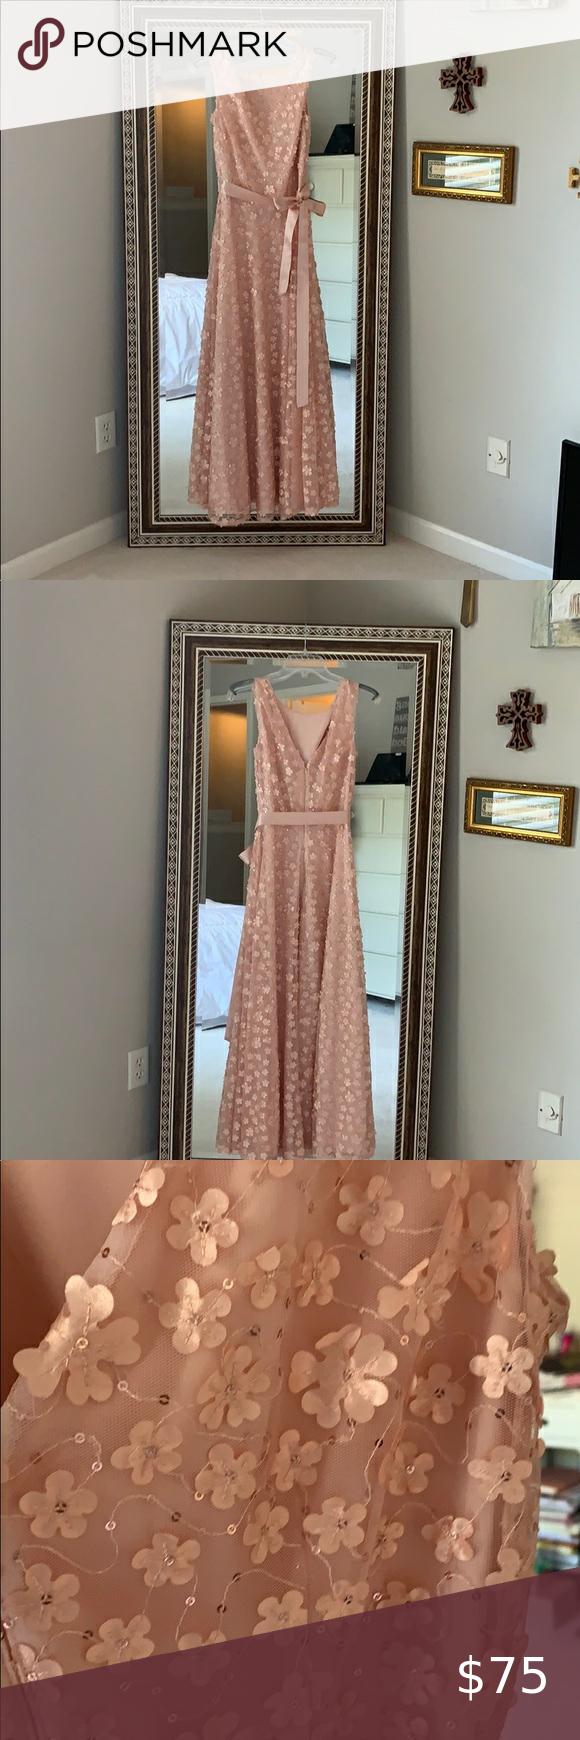 Tahari Formal Dress Formal Dresses Tahari Dress Tahari [ 1740 x 580 Pixel ]